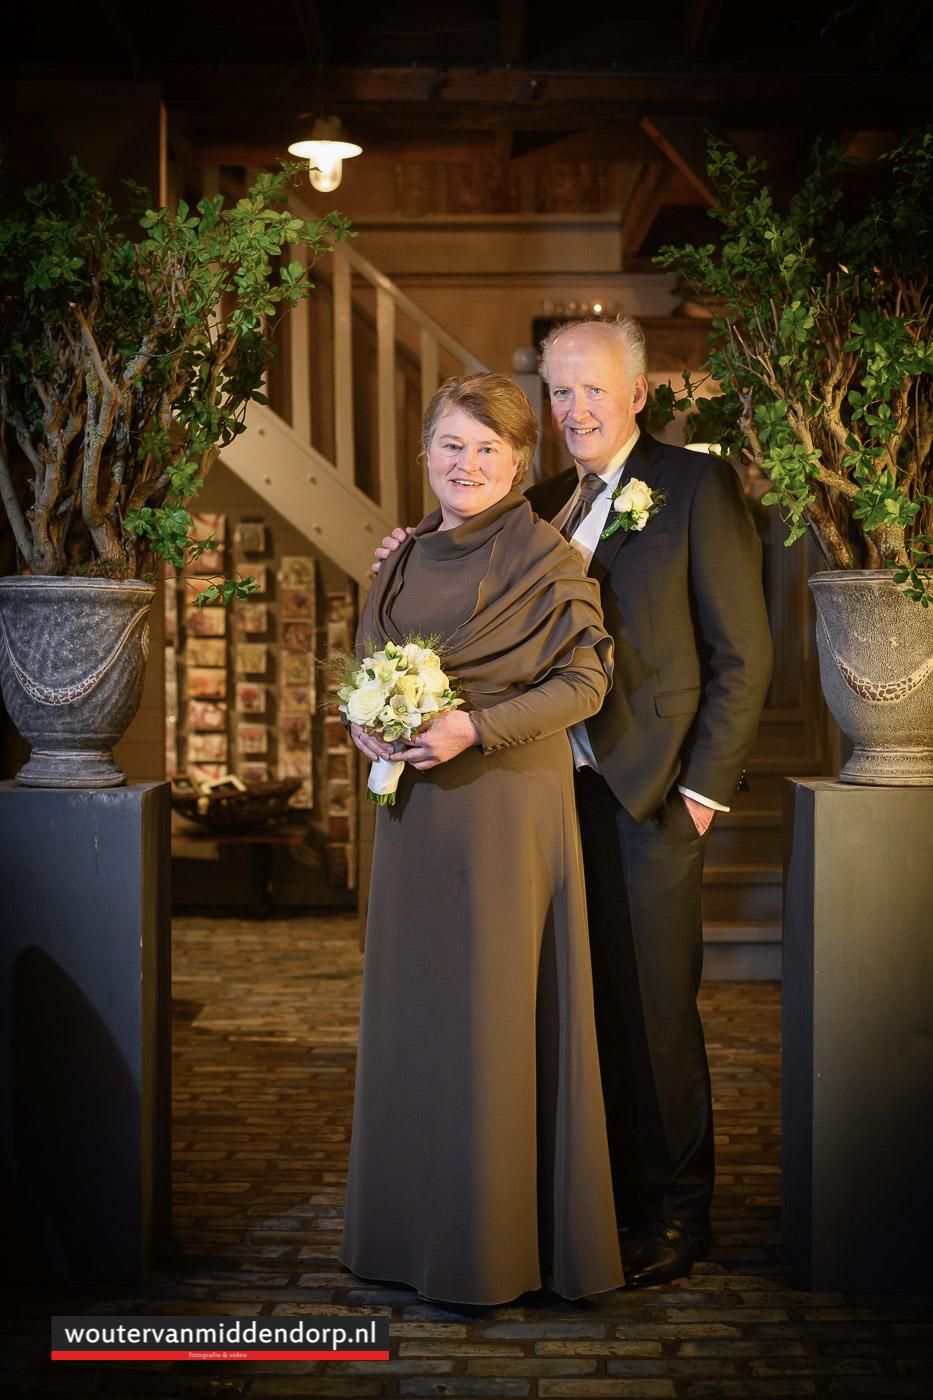 bruidsfotografie Wouter van Middendorp Uddel Elspeet Barneveld, omgeving trouwfotograaf-19